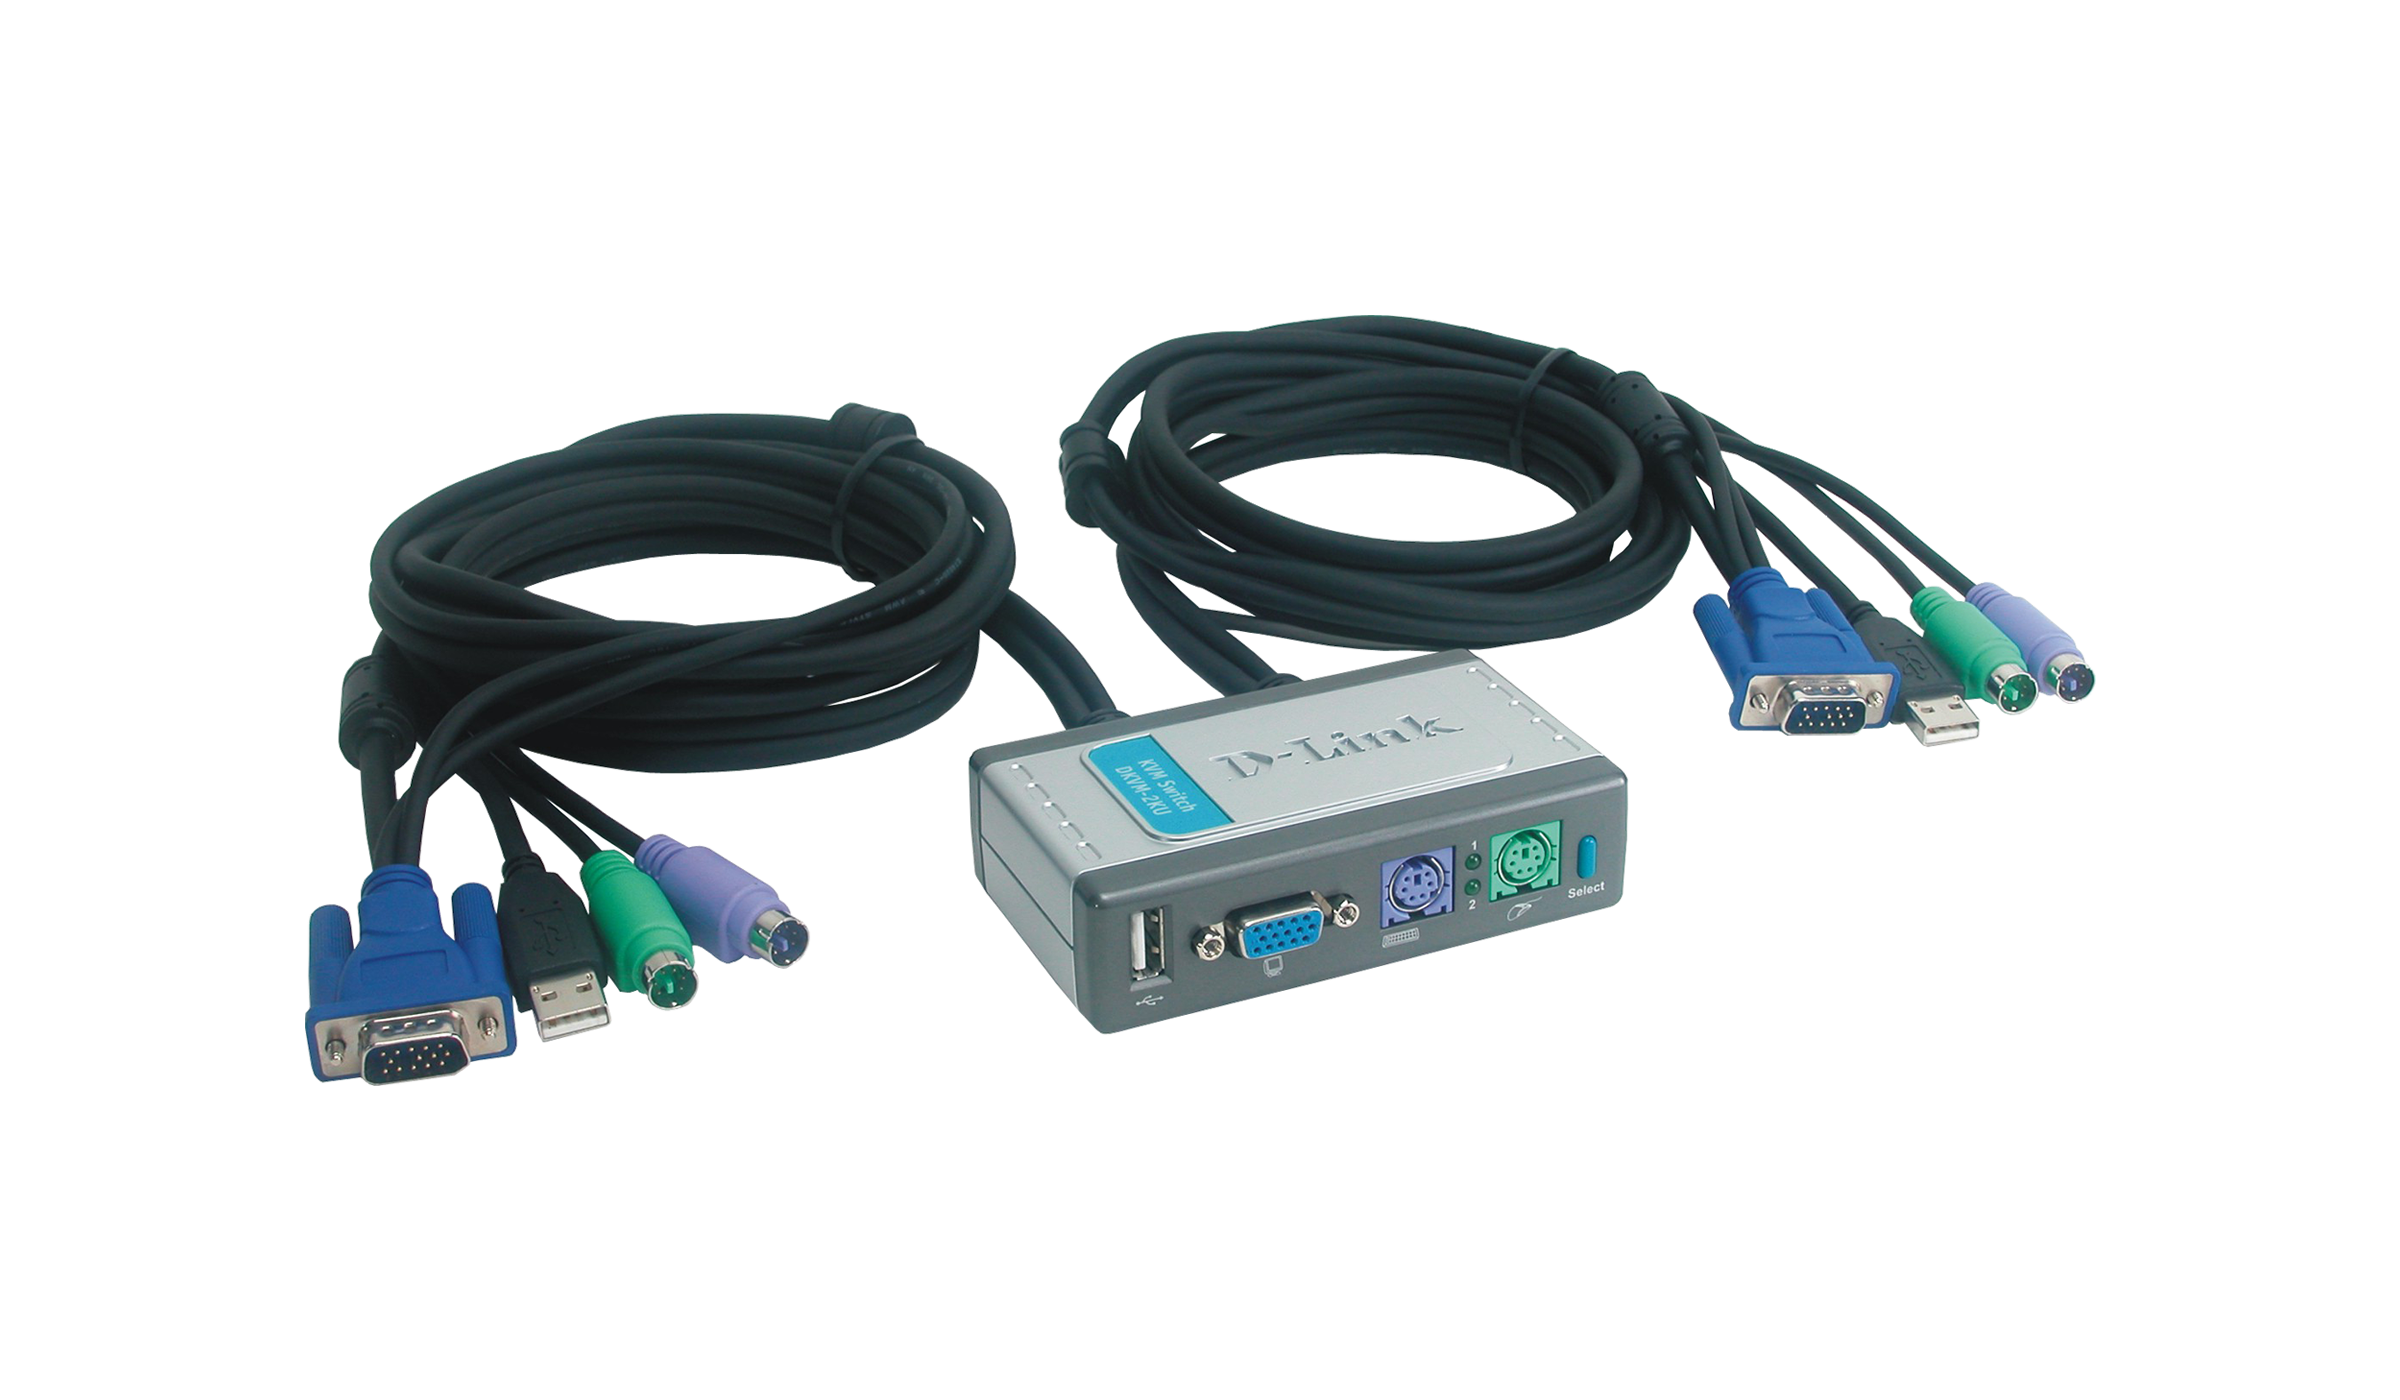 2‑port kvm switch mit usb 2 0